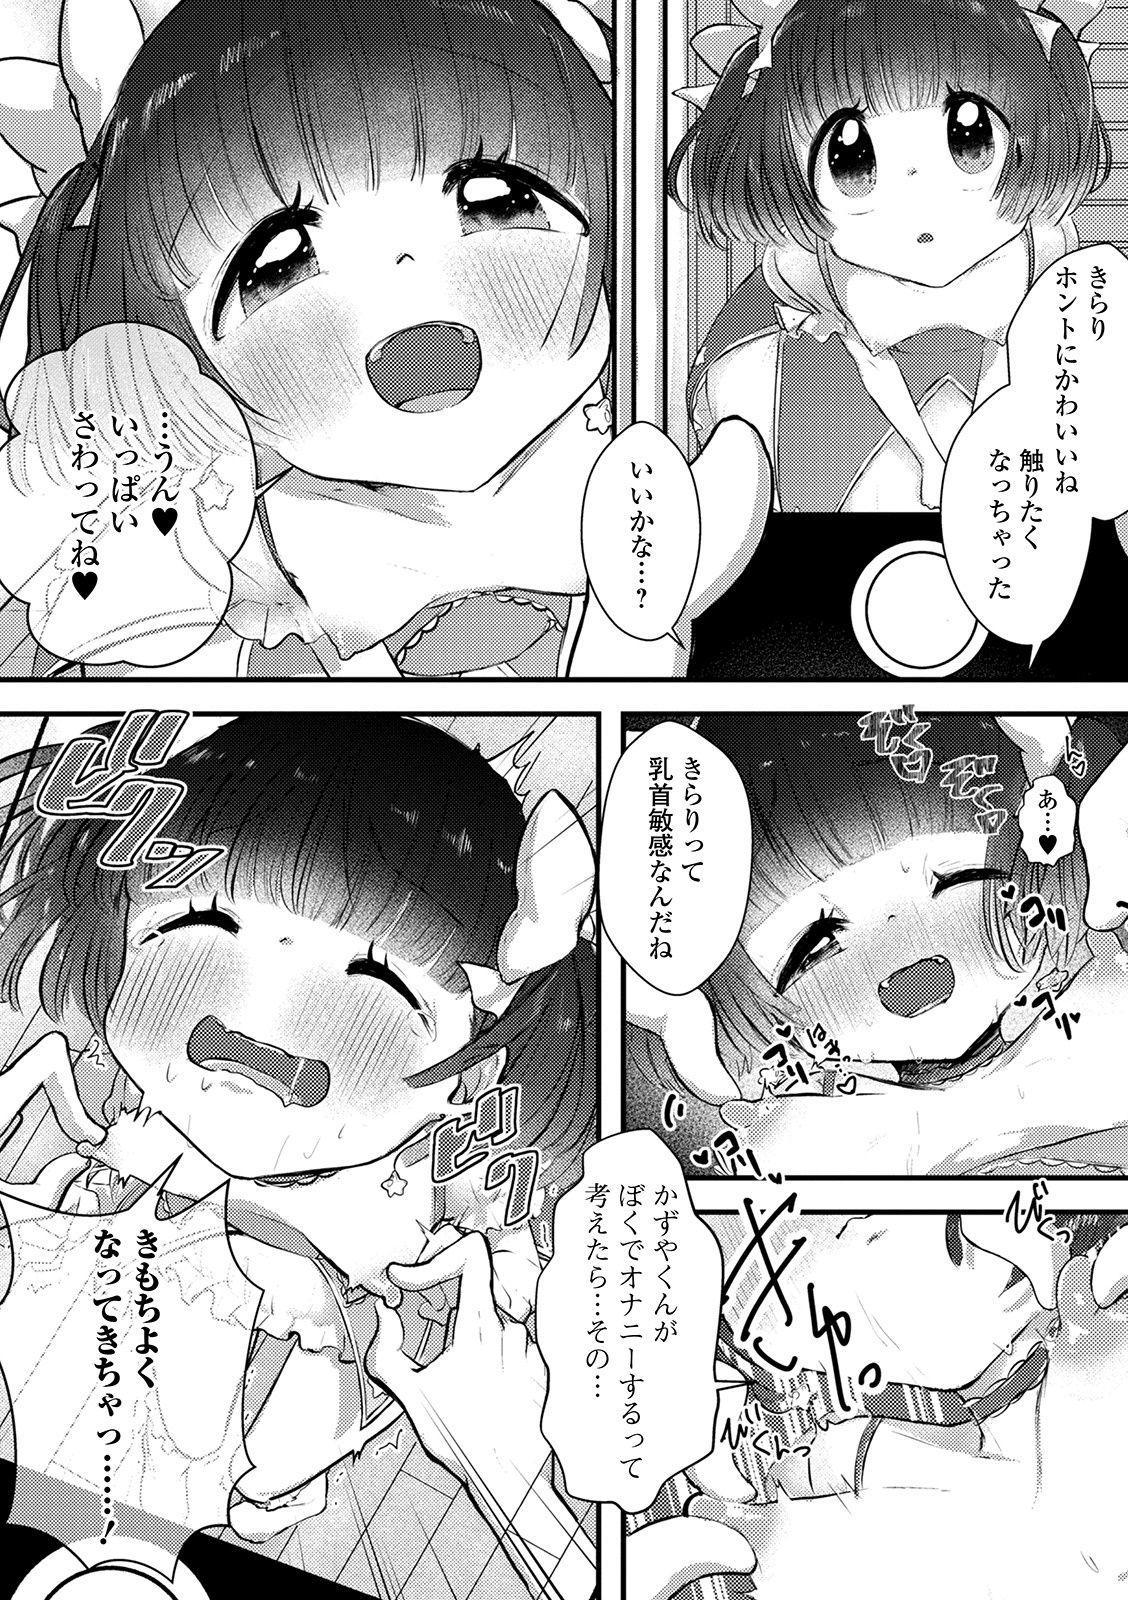 Gekkan Web Otoko no Ko-llection! S Vol. 53 91